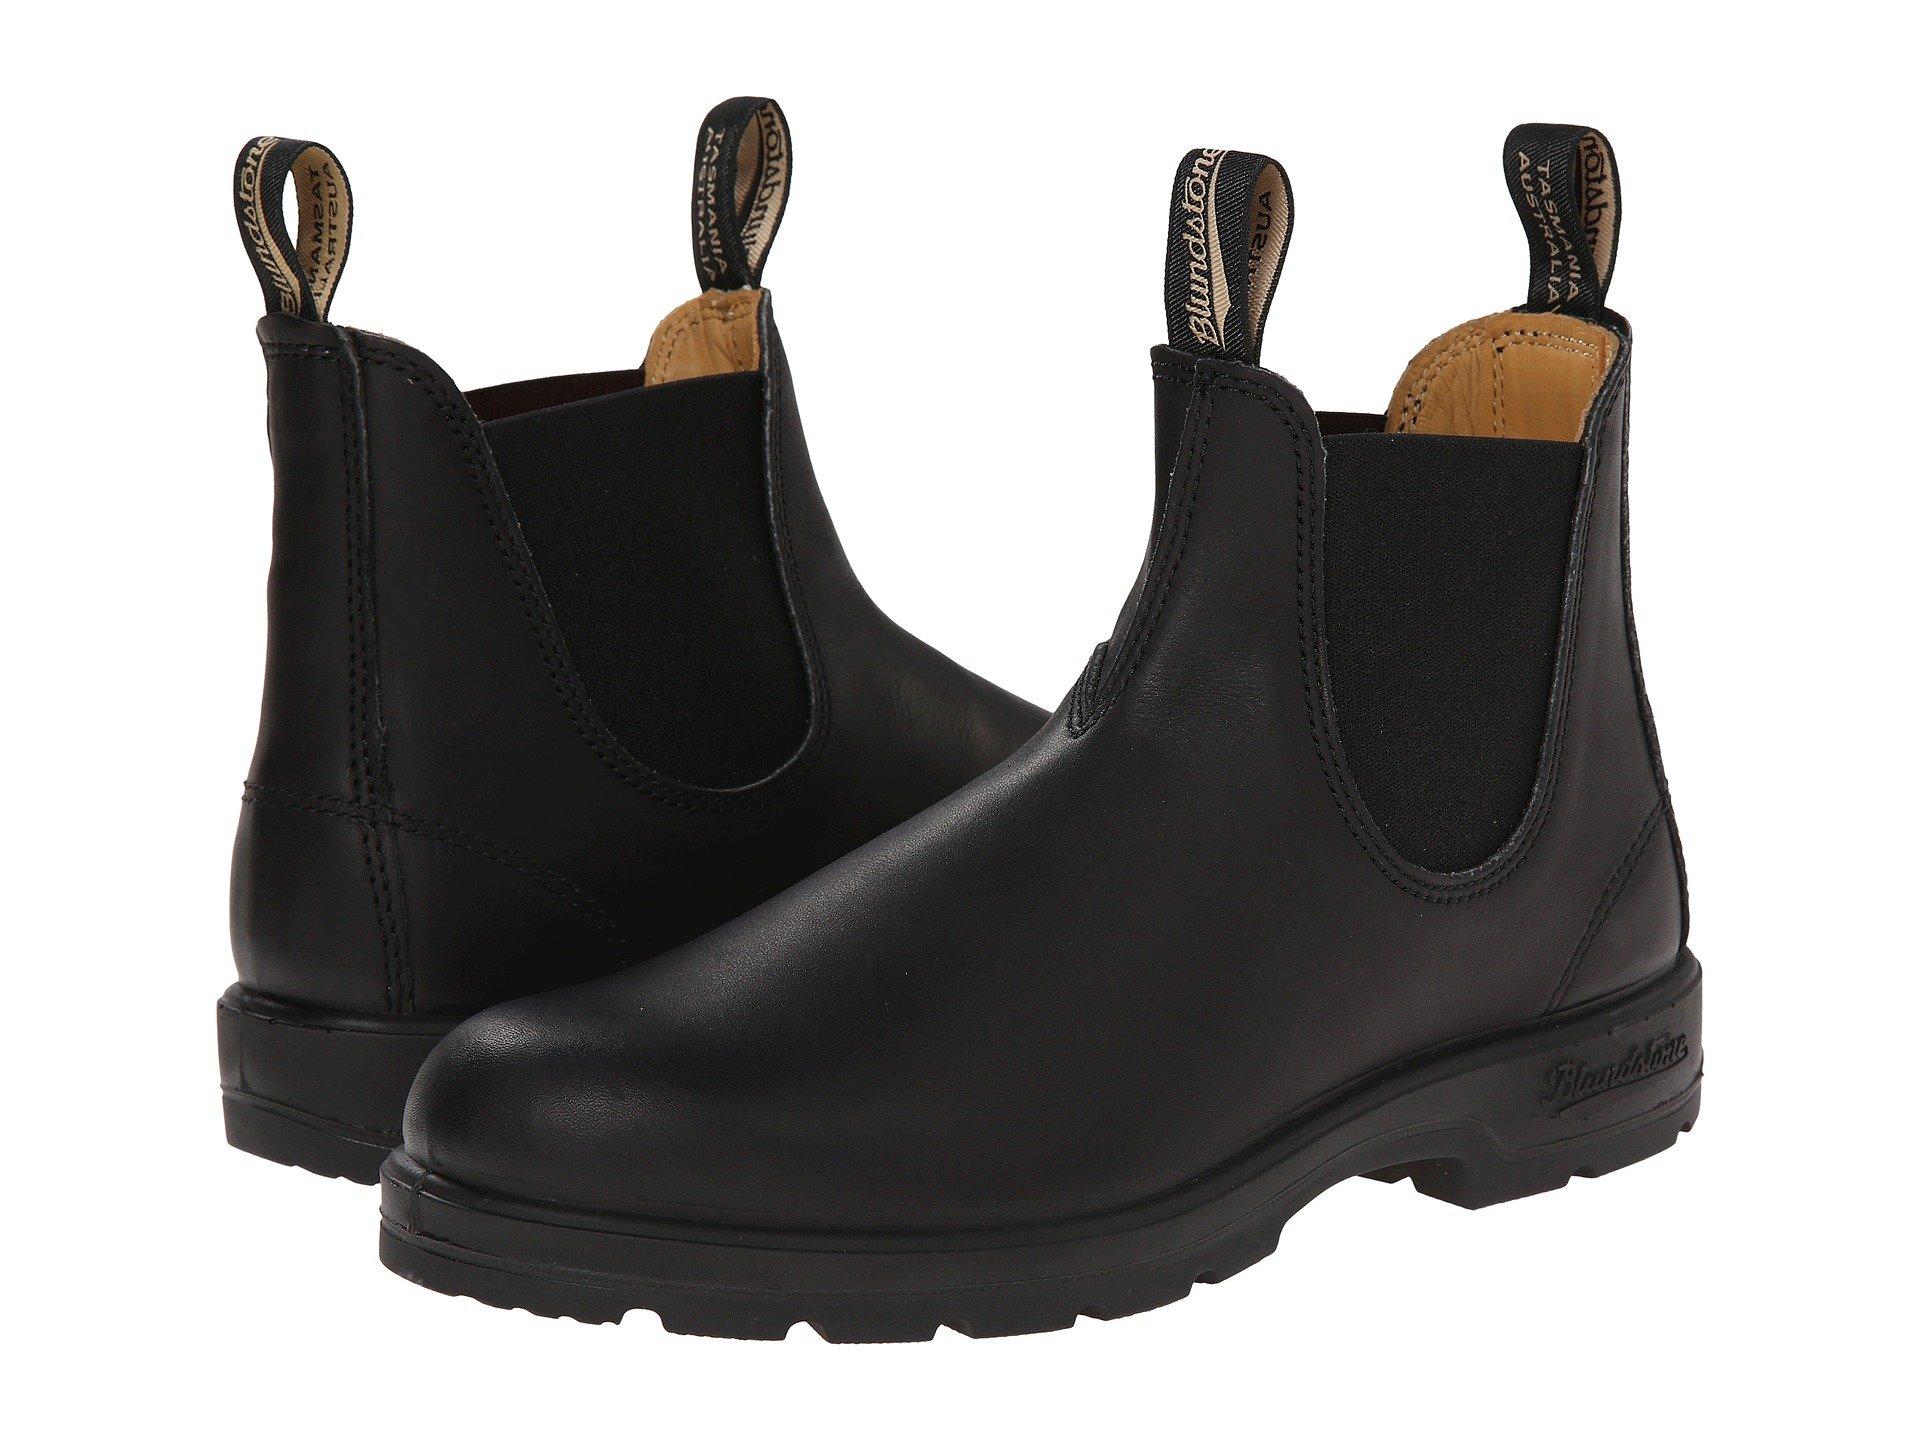 Women s Blundstone Boots + FREE SHIPPING  fcea7a287f625